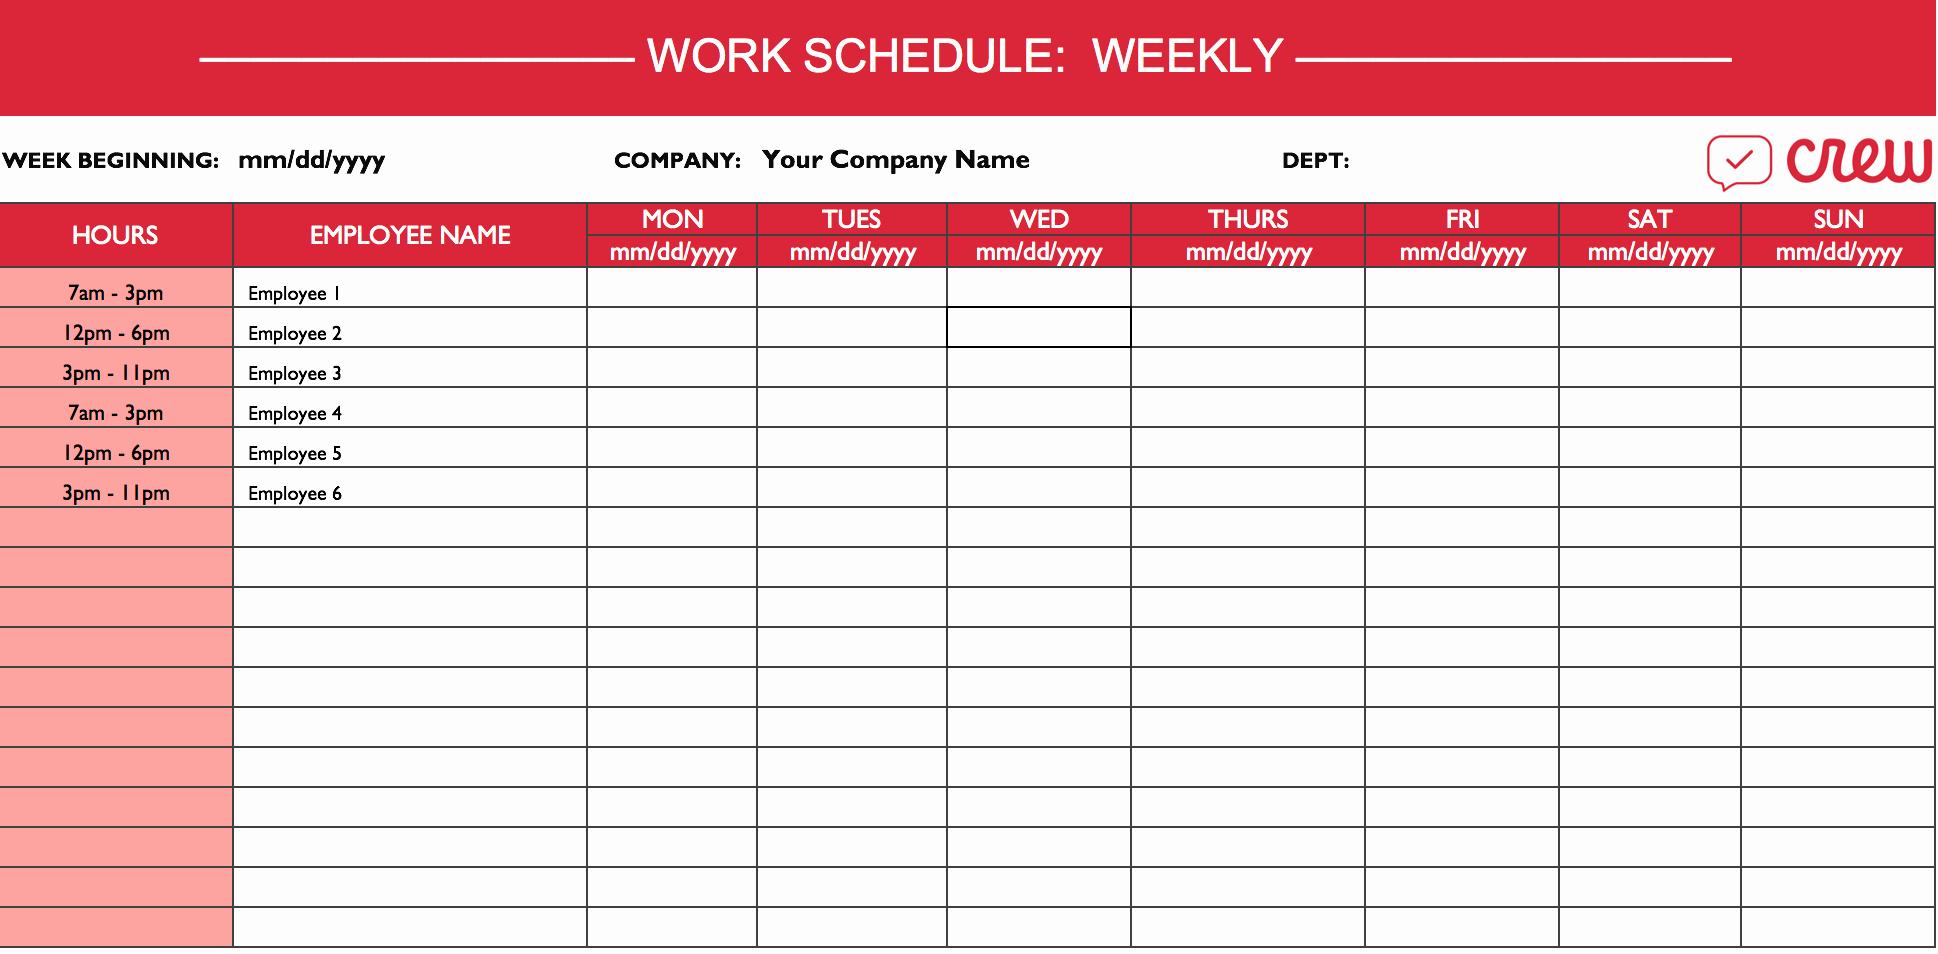 Weekly Staffing Schedule Template Luxury Weekly Work Schedule Template I Crew